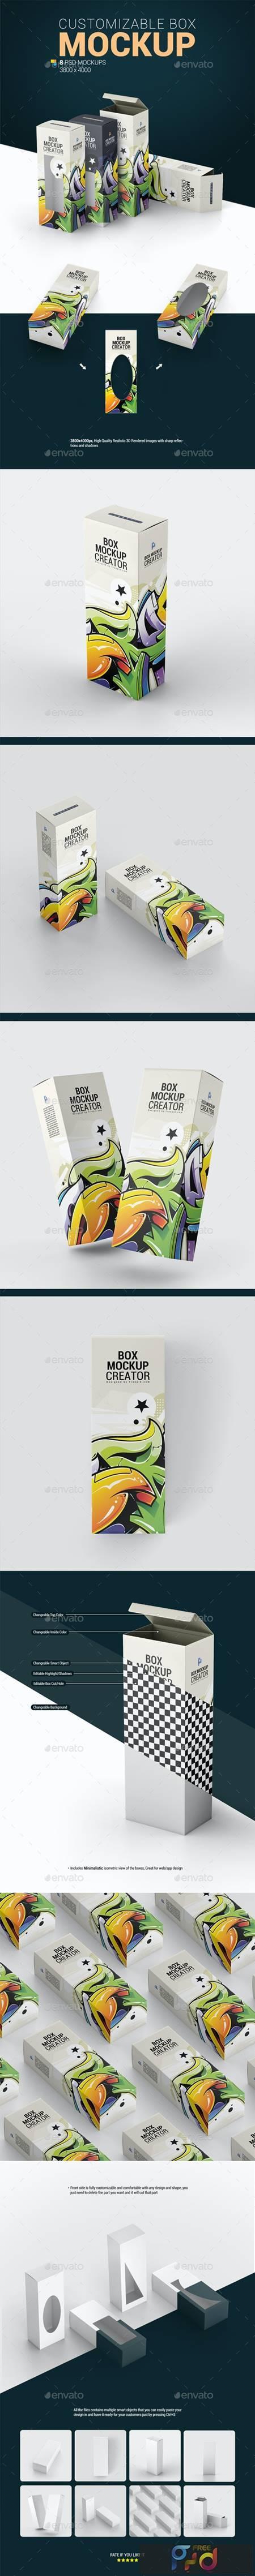 Box Mockup 27540955 1